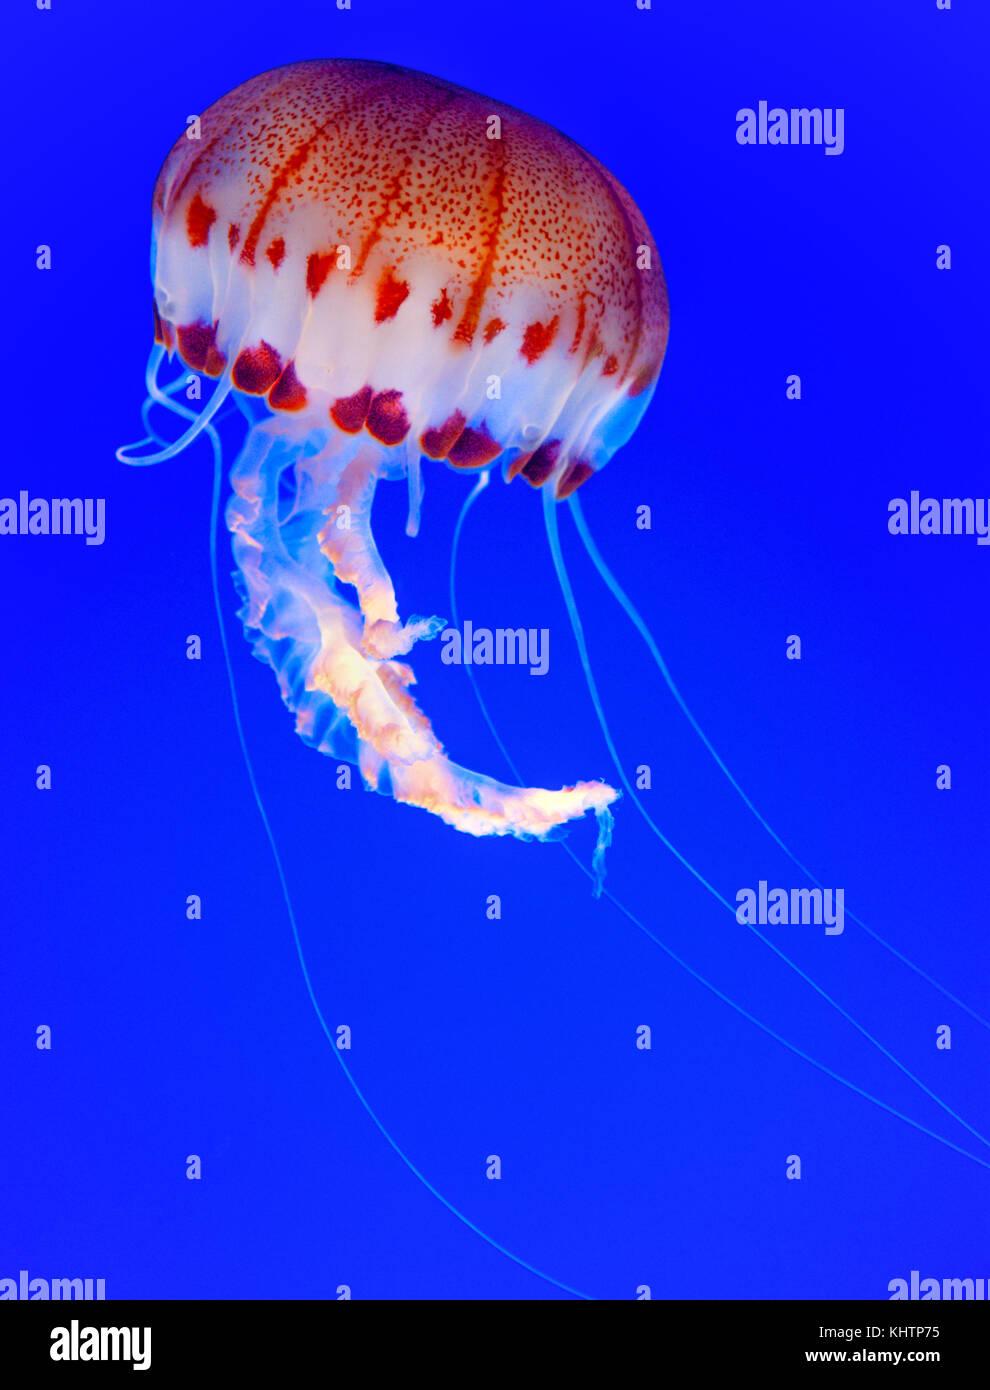 Un jpurple ellyfish à rayures (Chrysaora colorata) à l'Aquarium de Monterey Bay, CA U.S.A Photo Stock